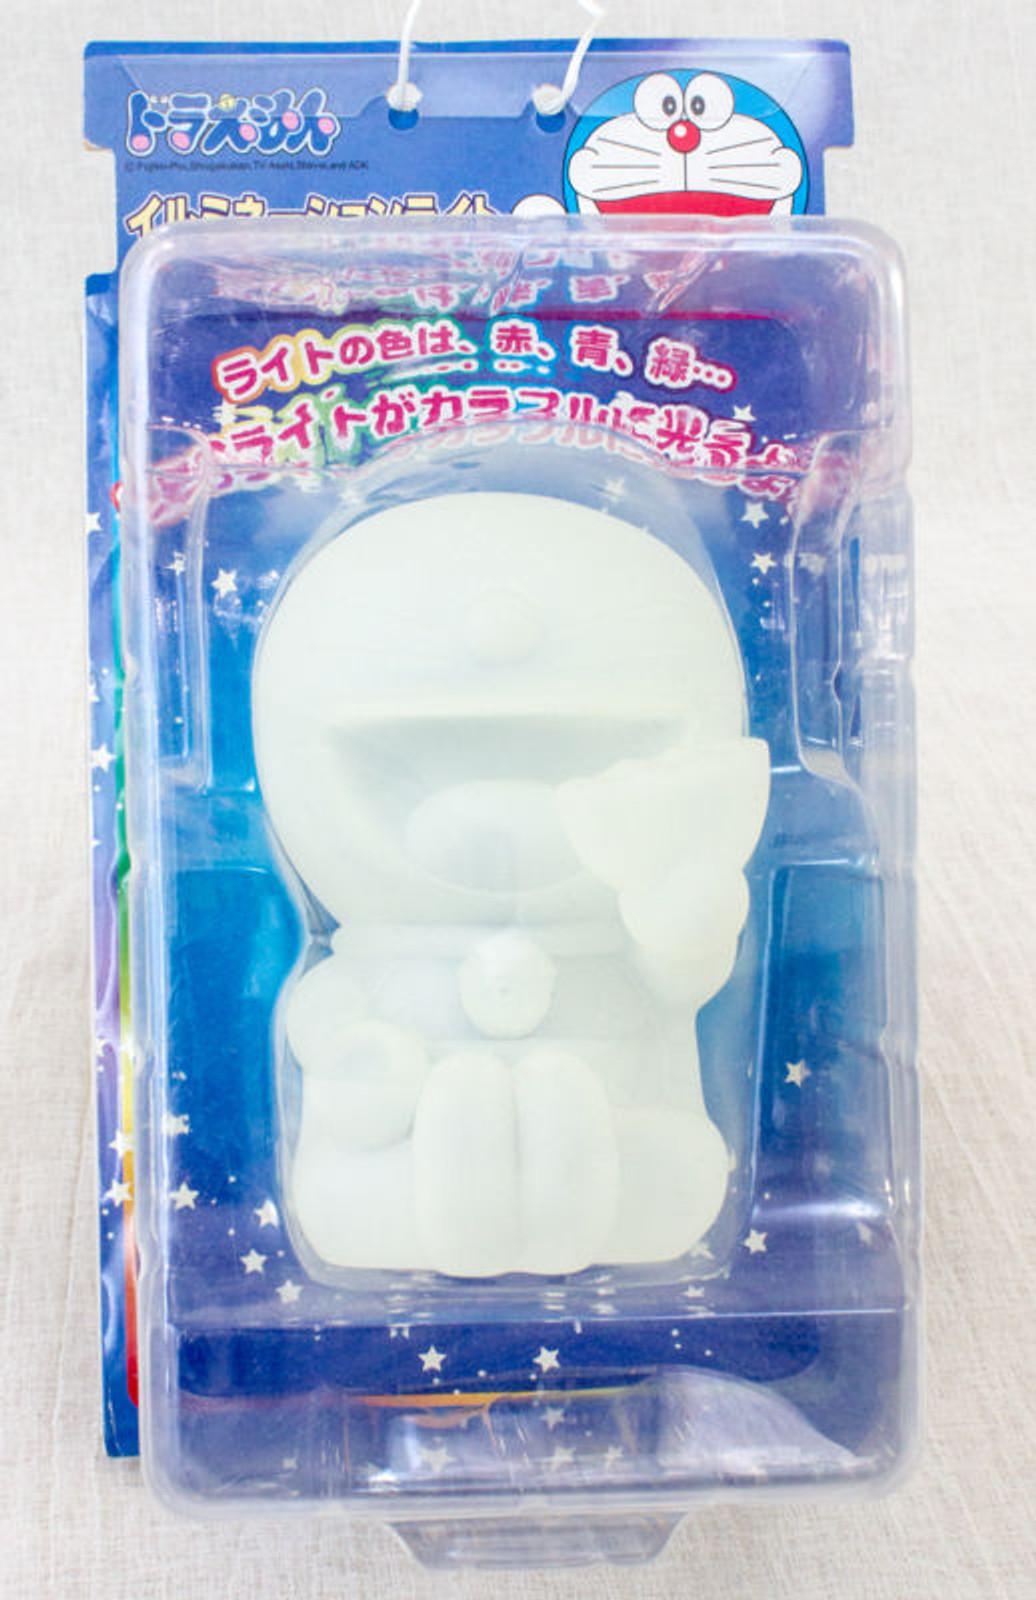 Doraemon Figure type Illumination LED Light Battery Operated JAPAN ANIME  FUJIO